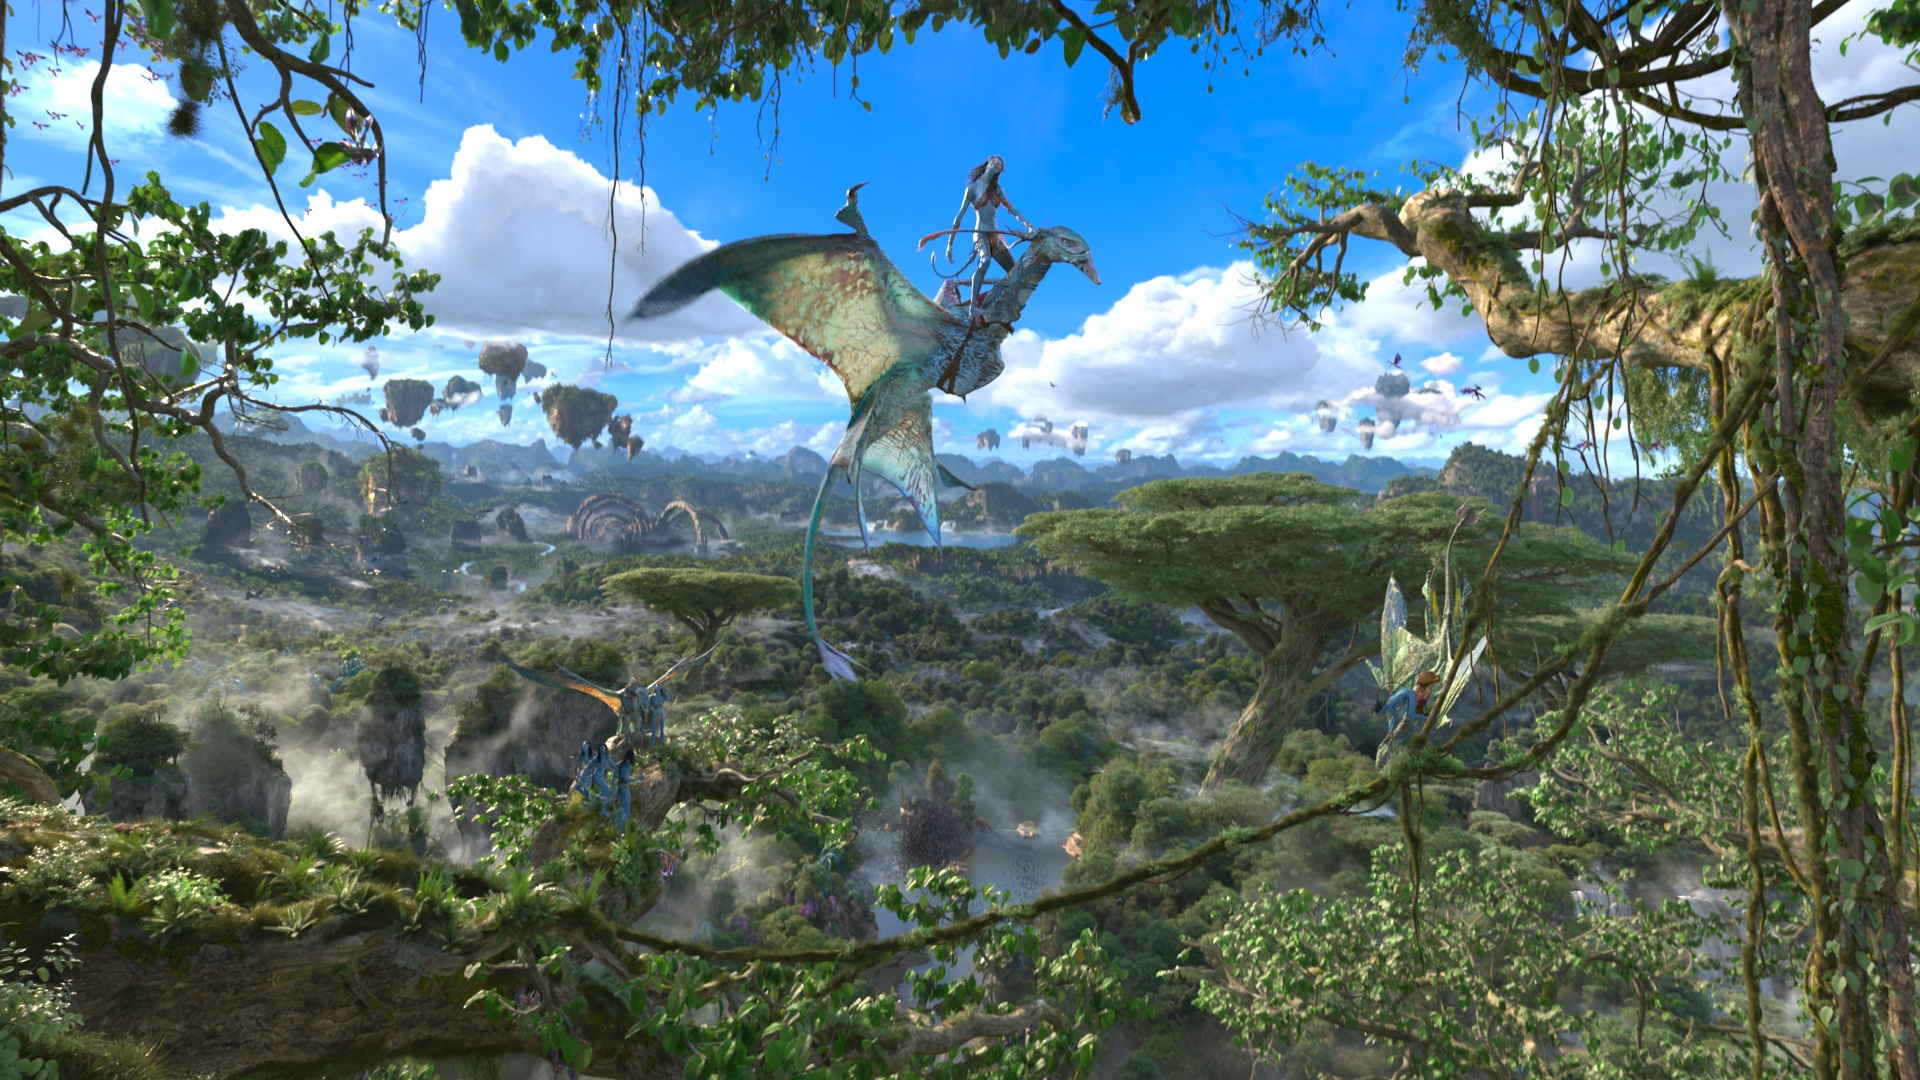 Avatar Flight of Passage on Pandora Ð The World of Avatar at Disney's Animal Kingdom